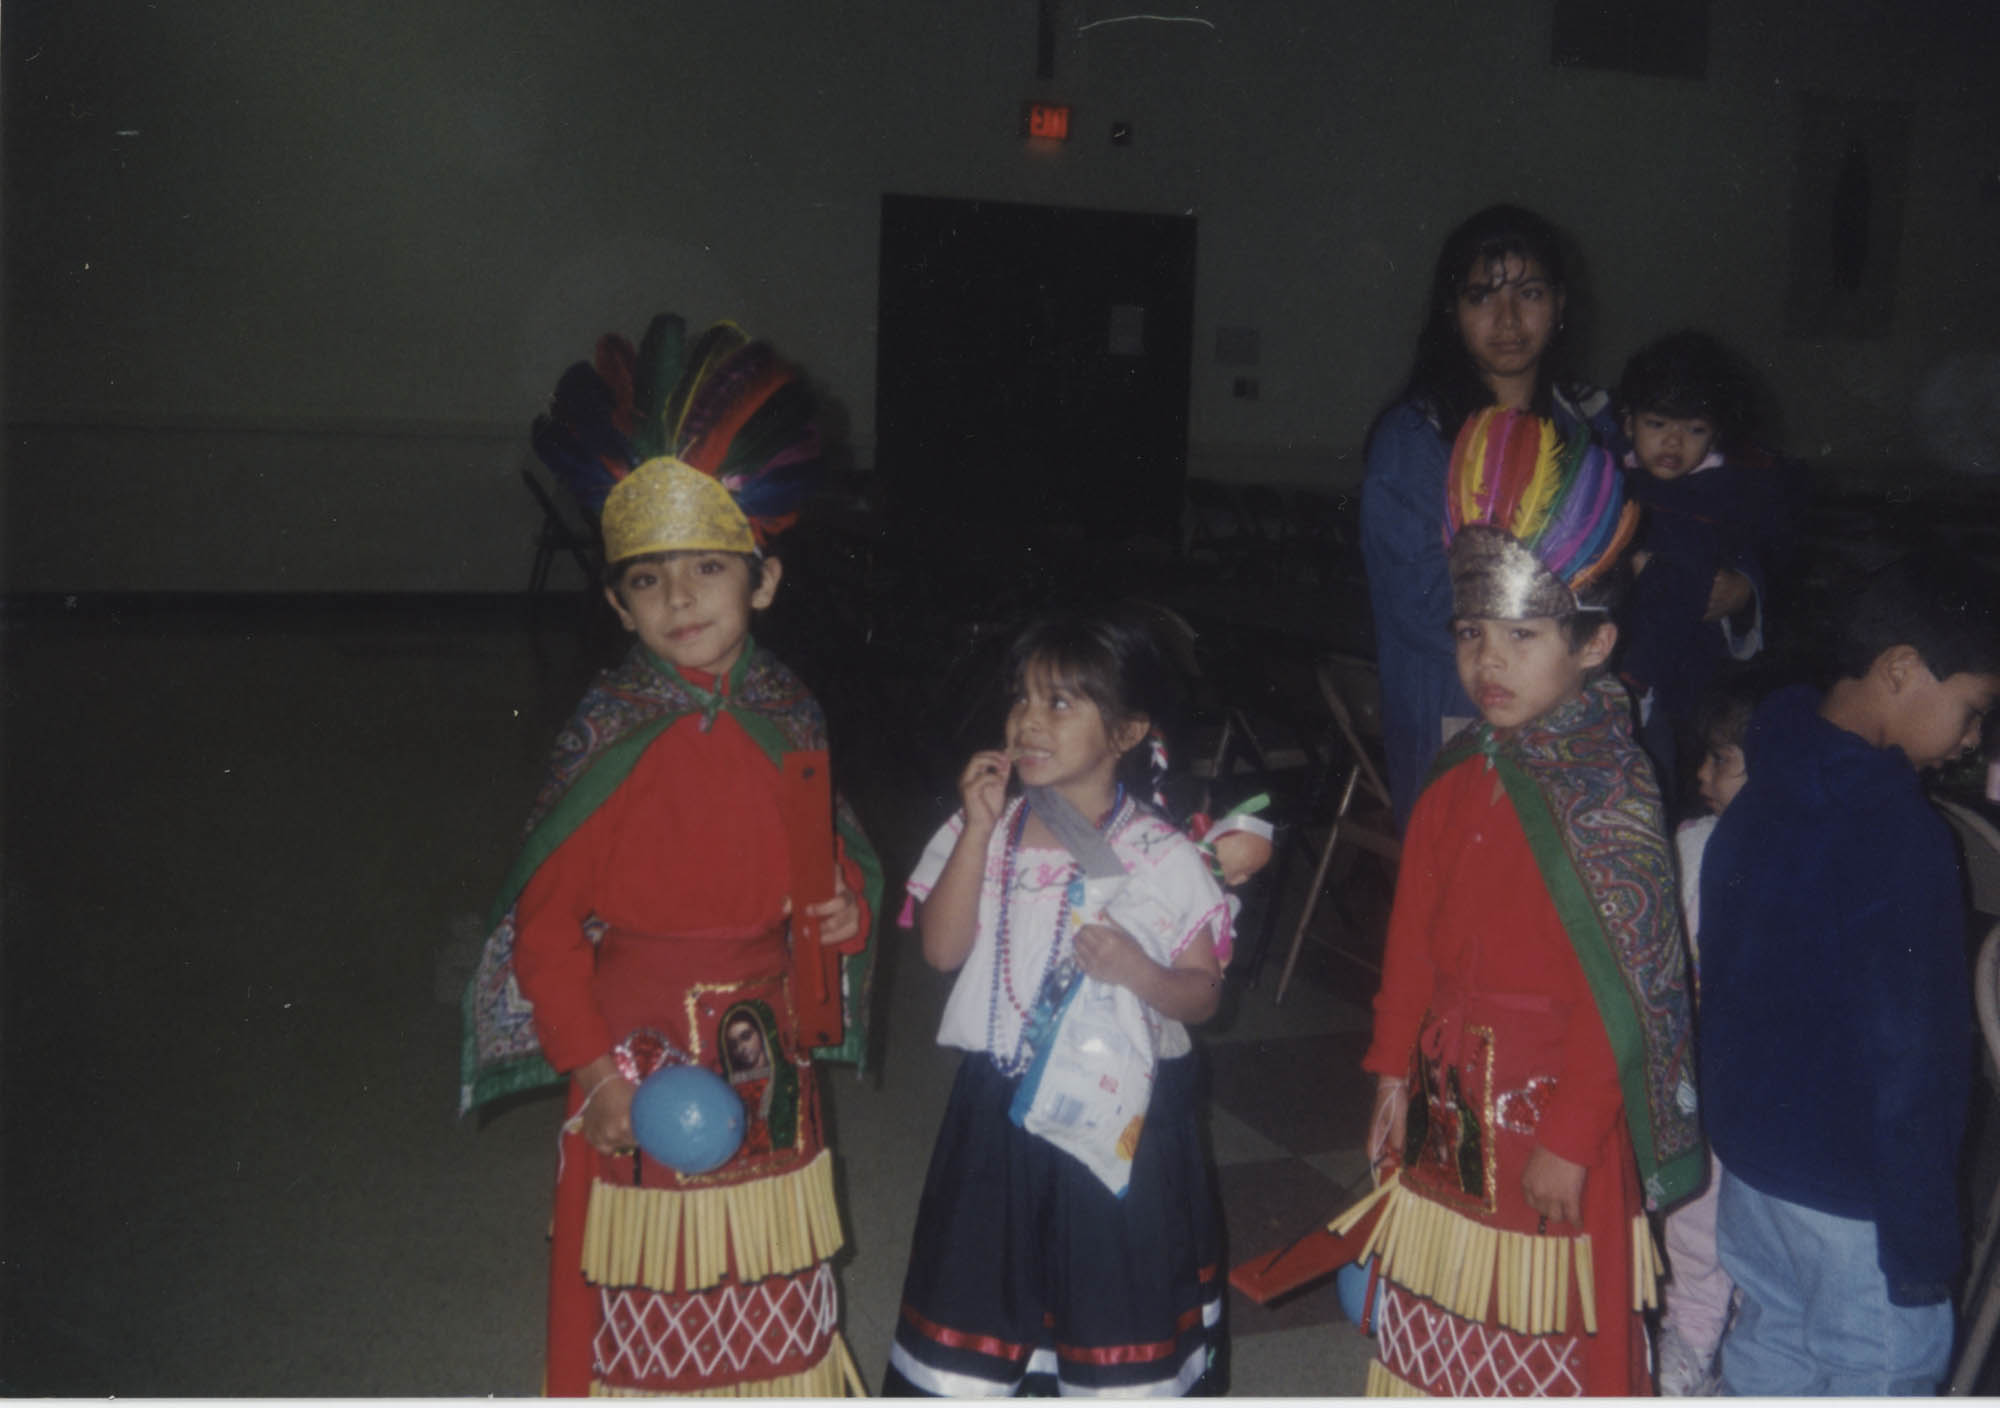 Fotografía de un grupo de niños en la celebración de la Virgen de Guadalupe  /  Photograph of Children at the Our Lady of Guadalupe Celebration